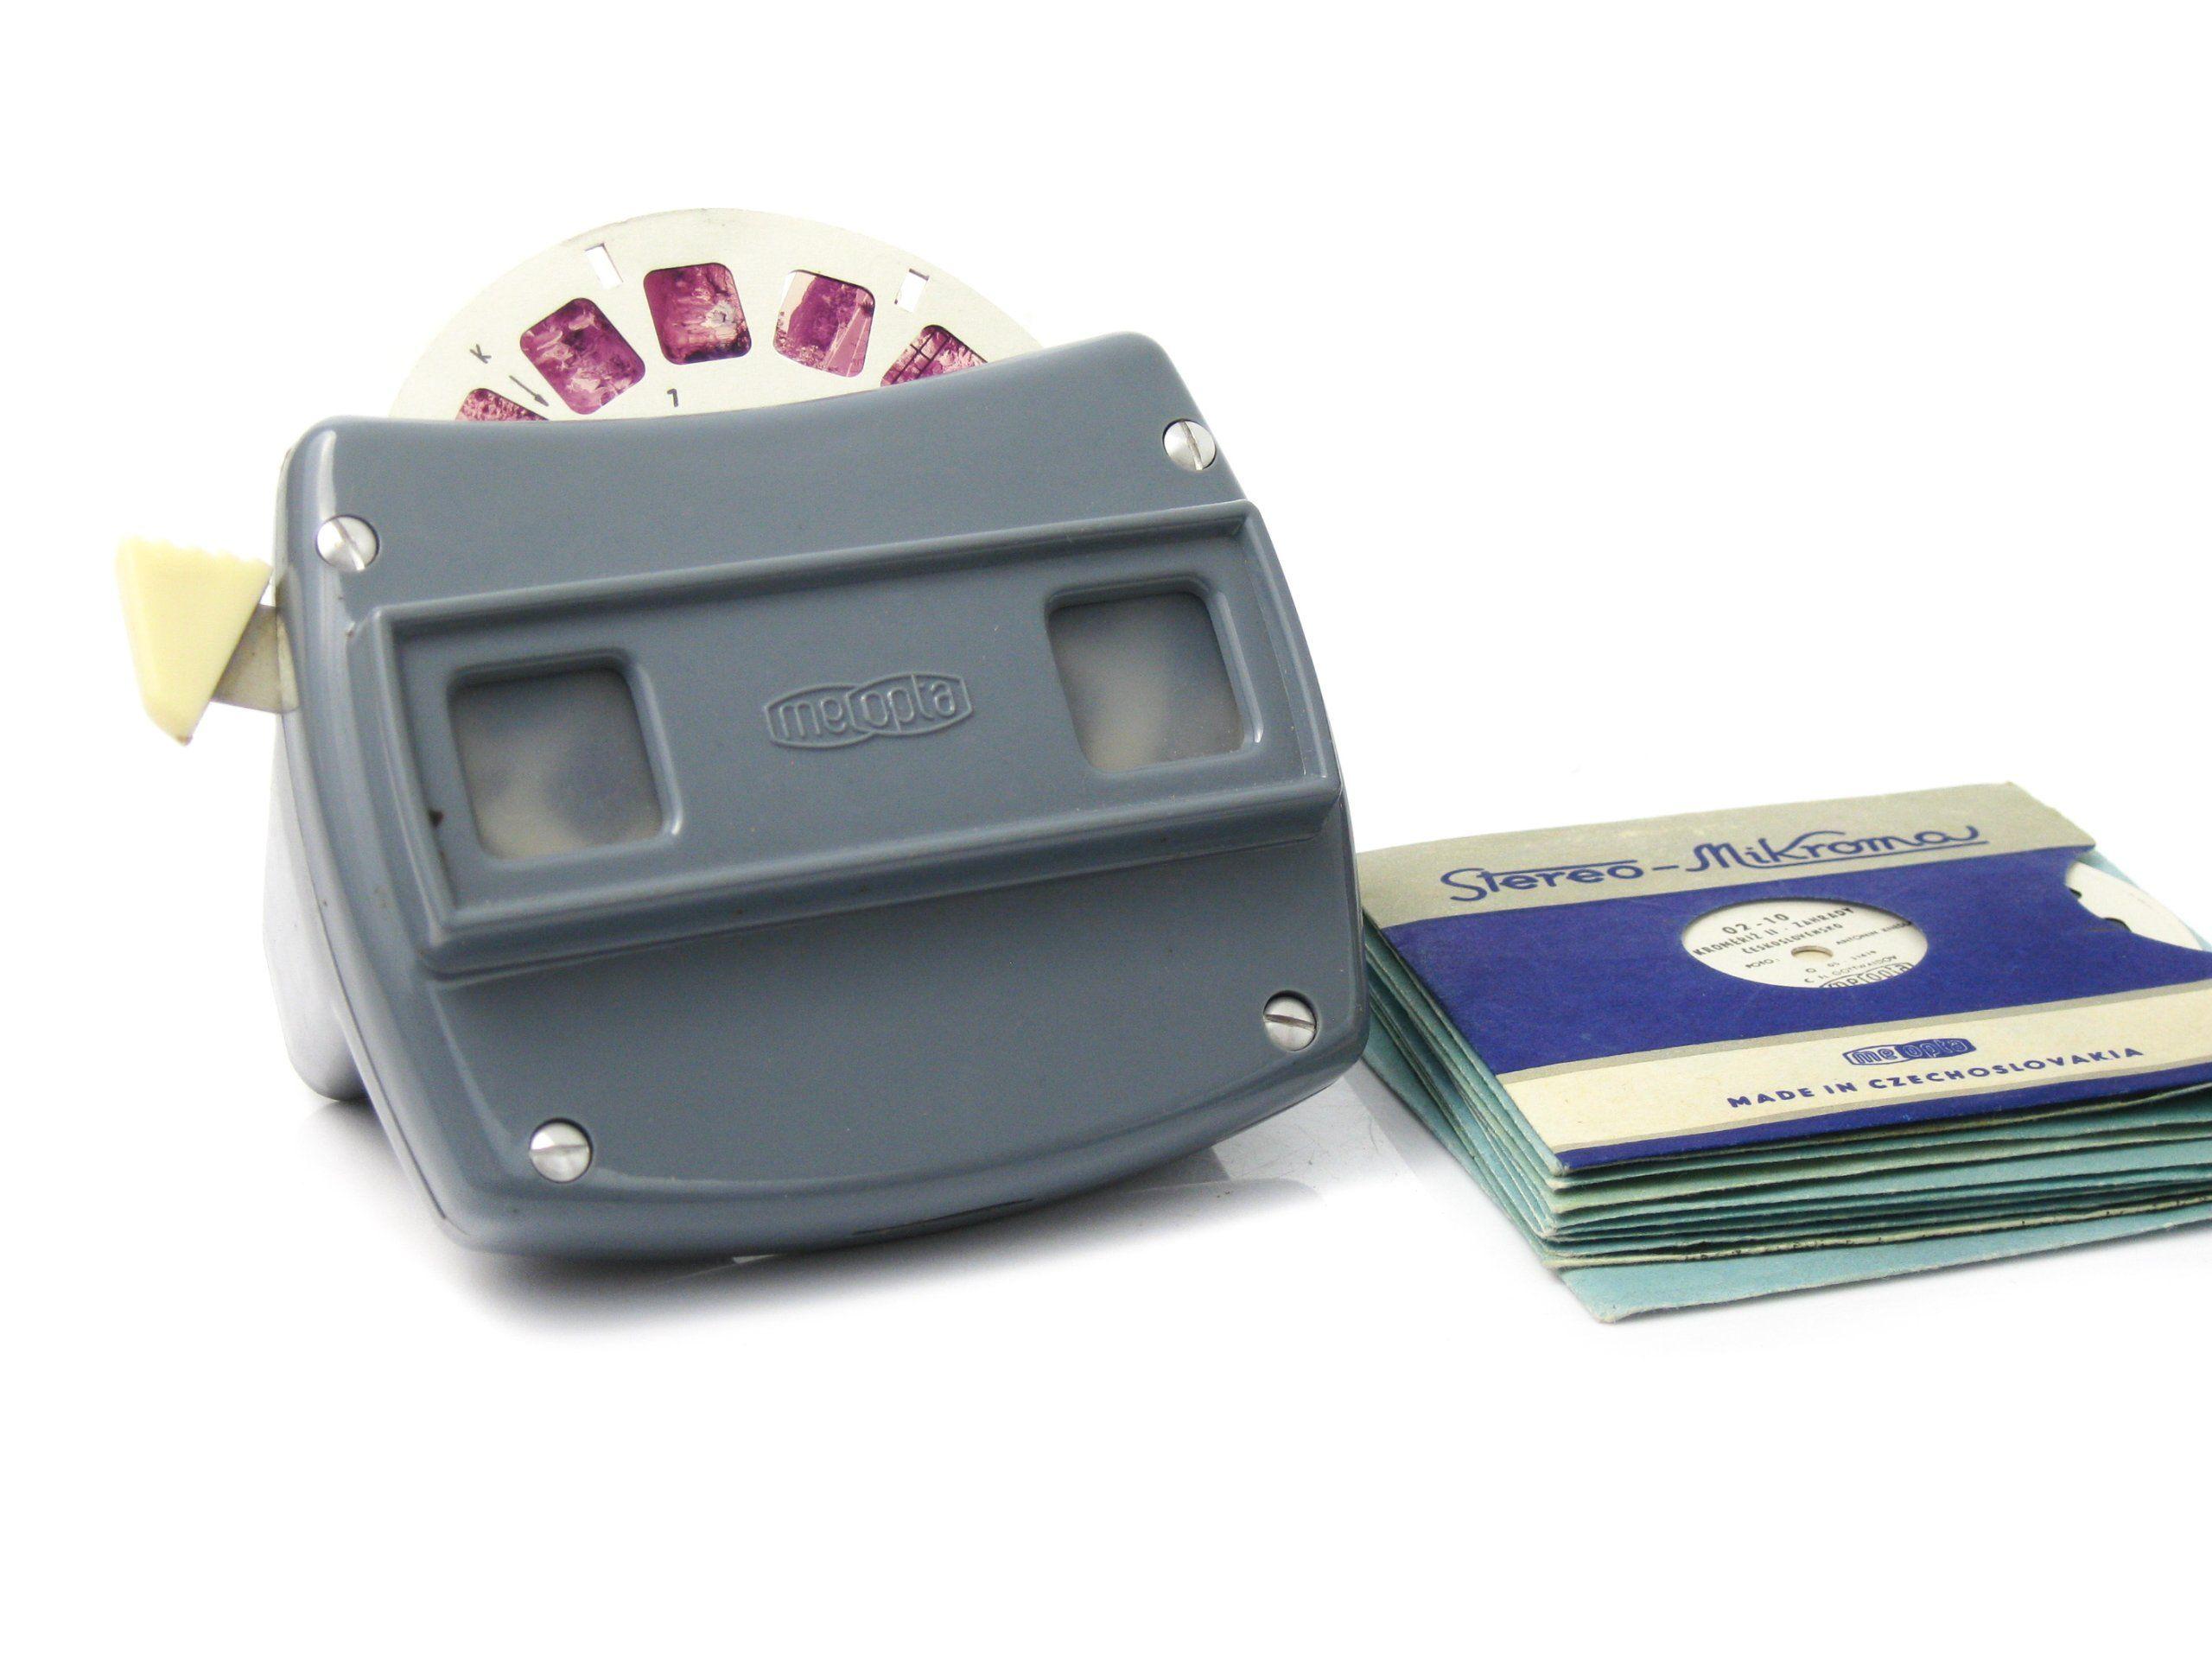 Przegladarka Do Zdjec Stereoskopowych 3d Meoskop 7103518240 Oficjalne Archiwum Allegro Gaming Products Camera Bag Nintendo Consoles